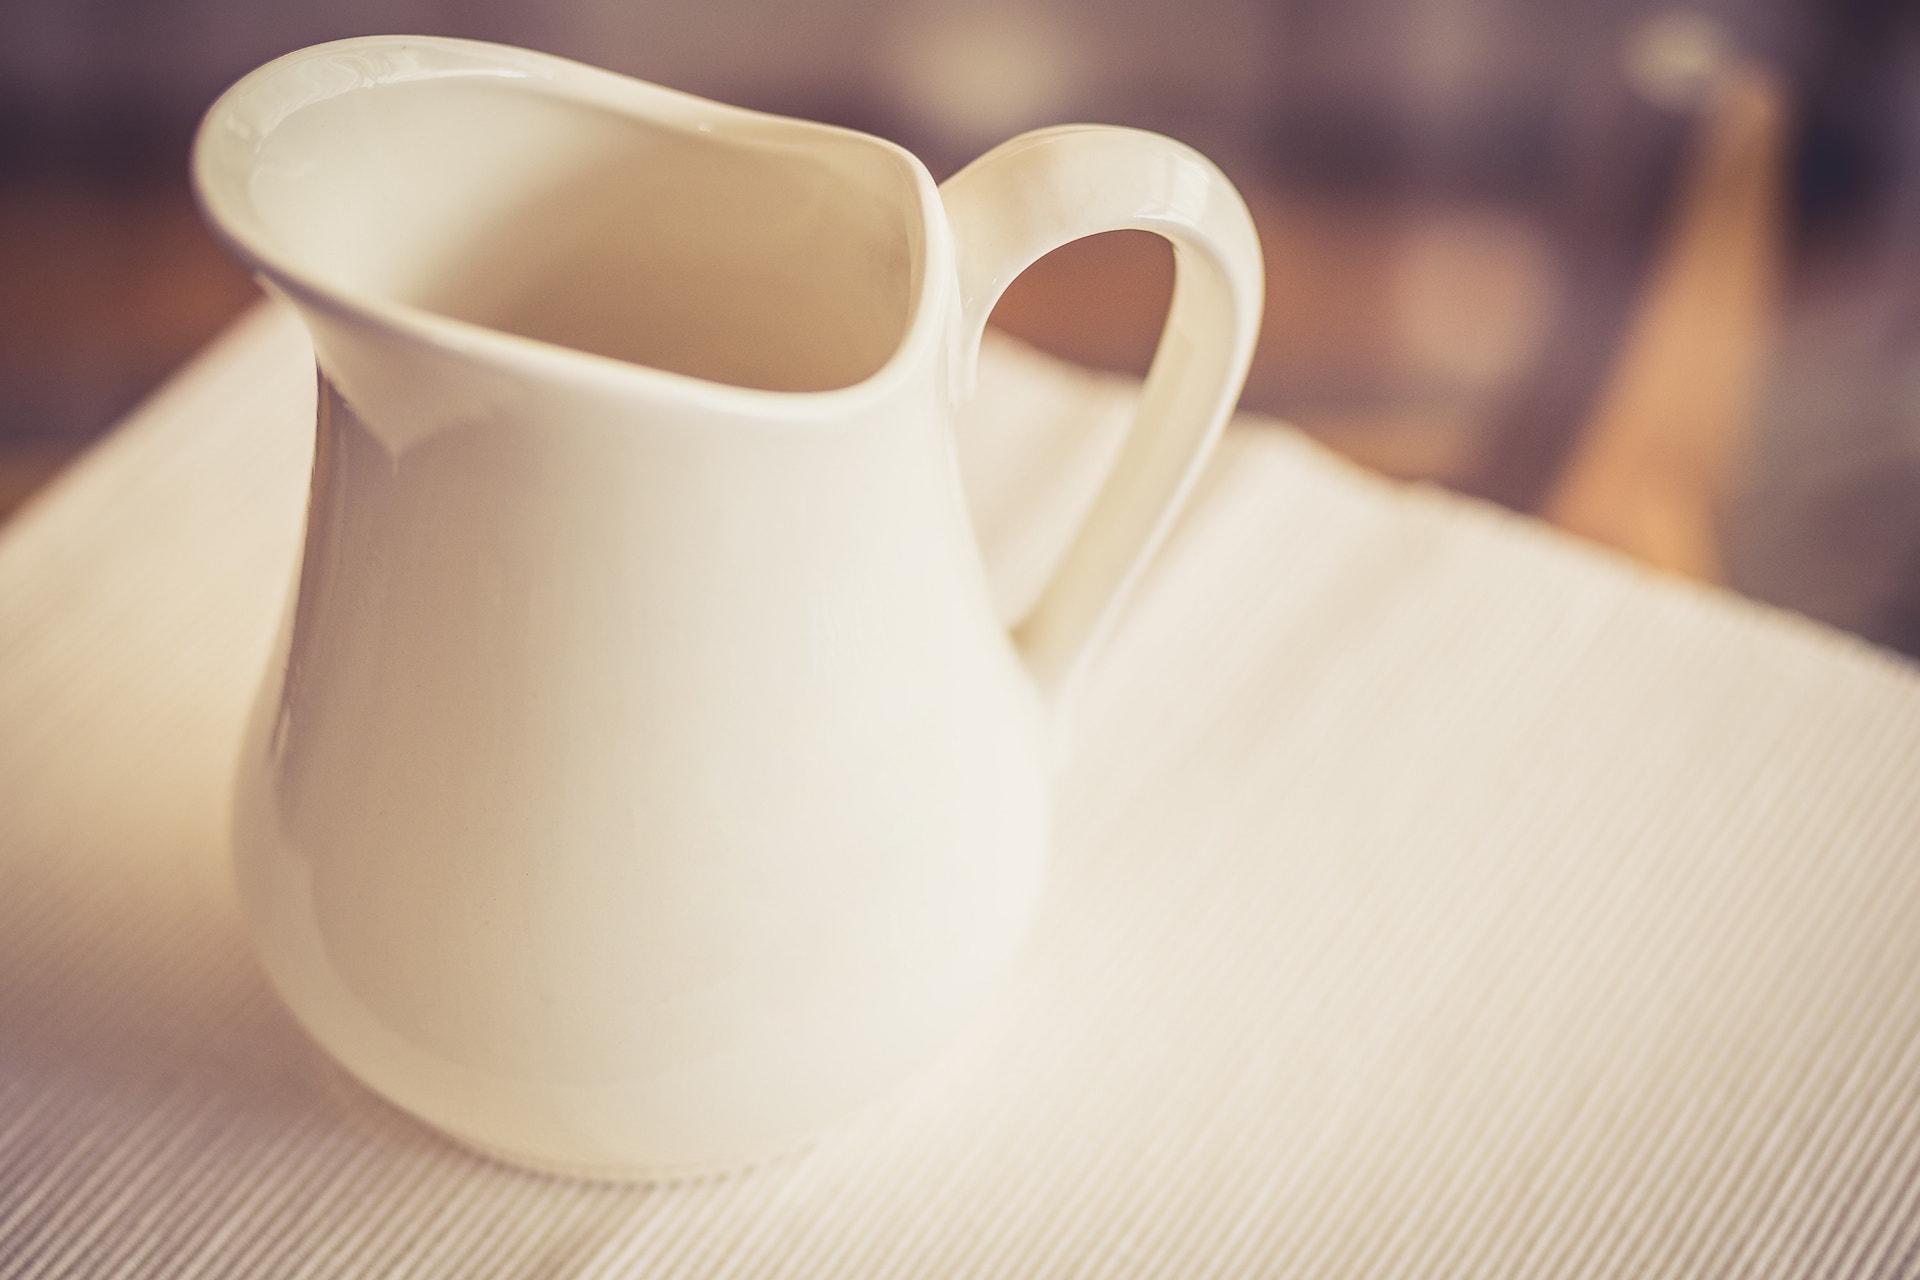 Milk Jug on a Glass Table - Warm Tone